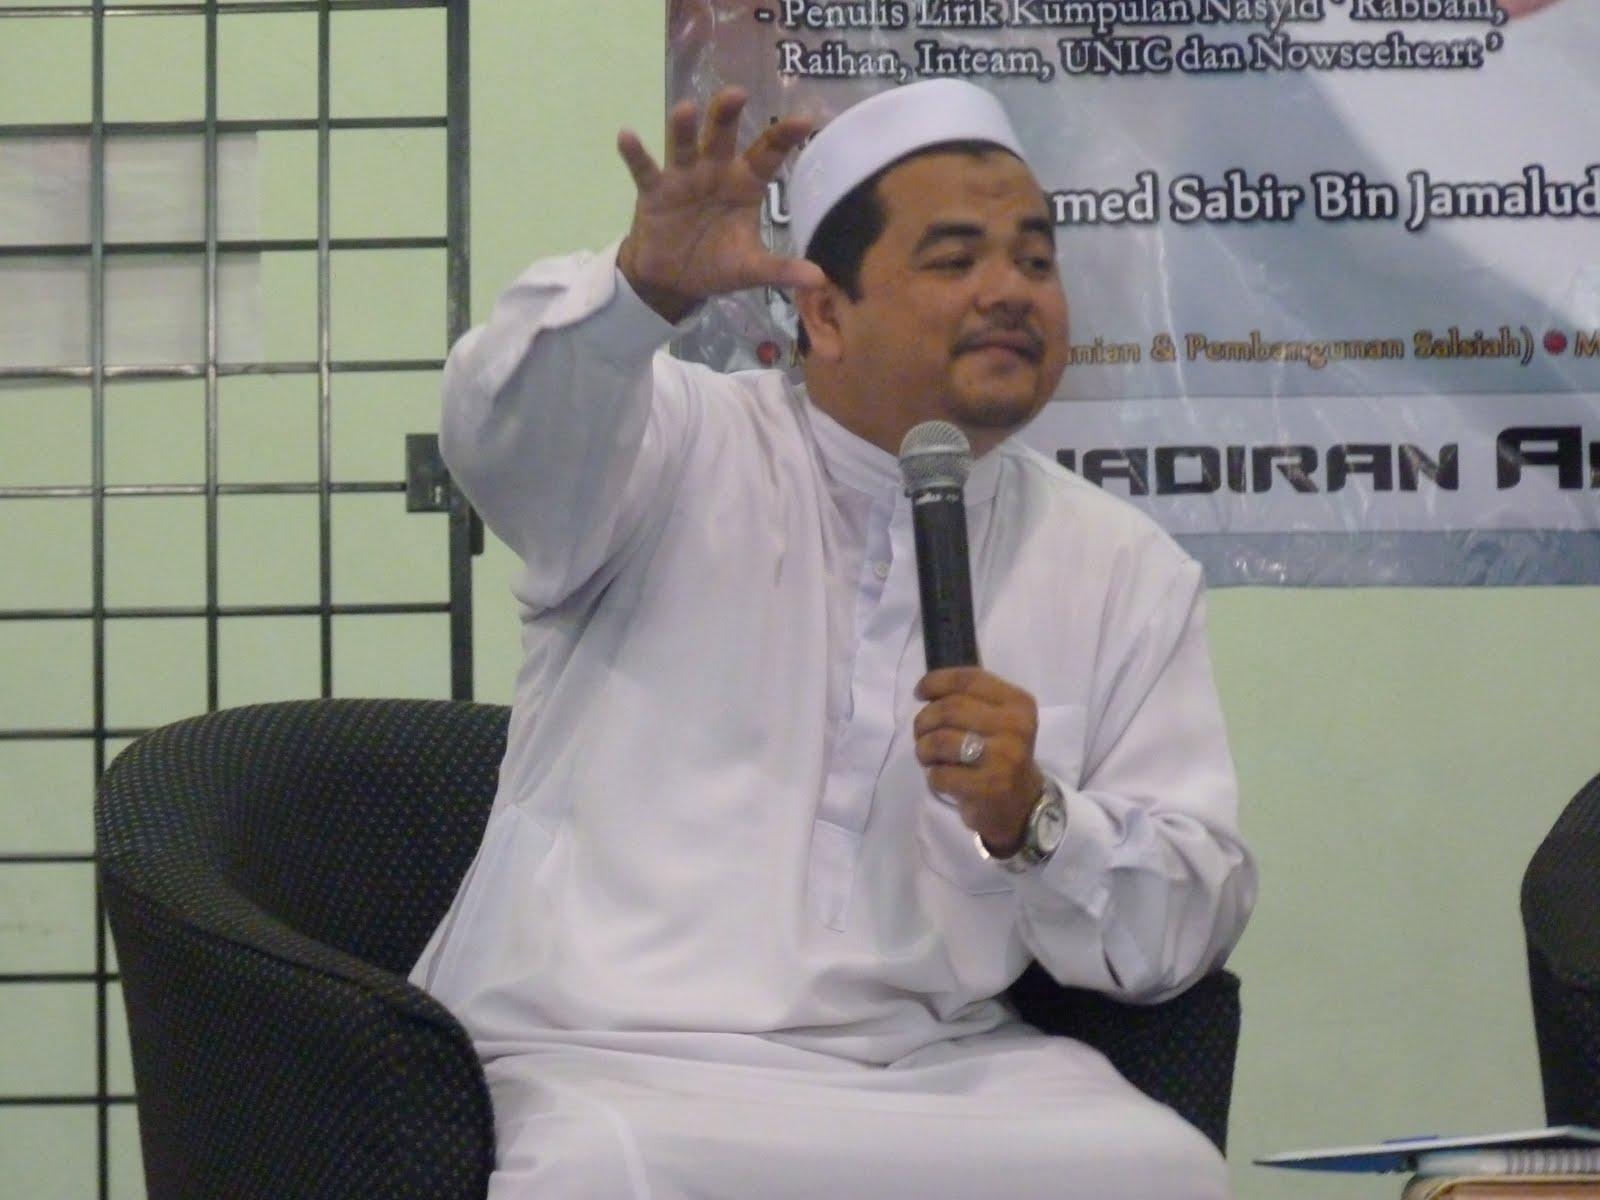 Dr. Ahmad Termizi Abdul Razak